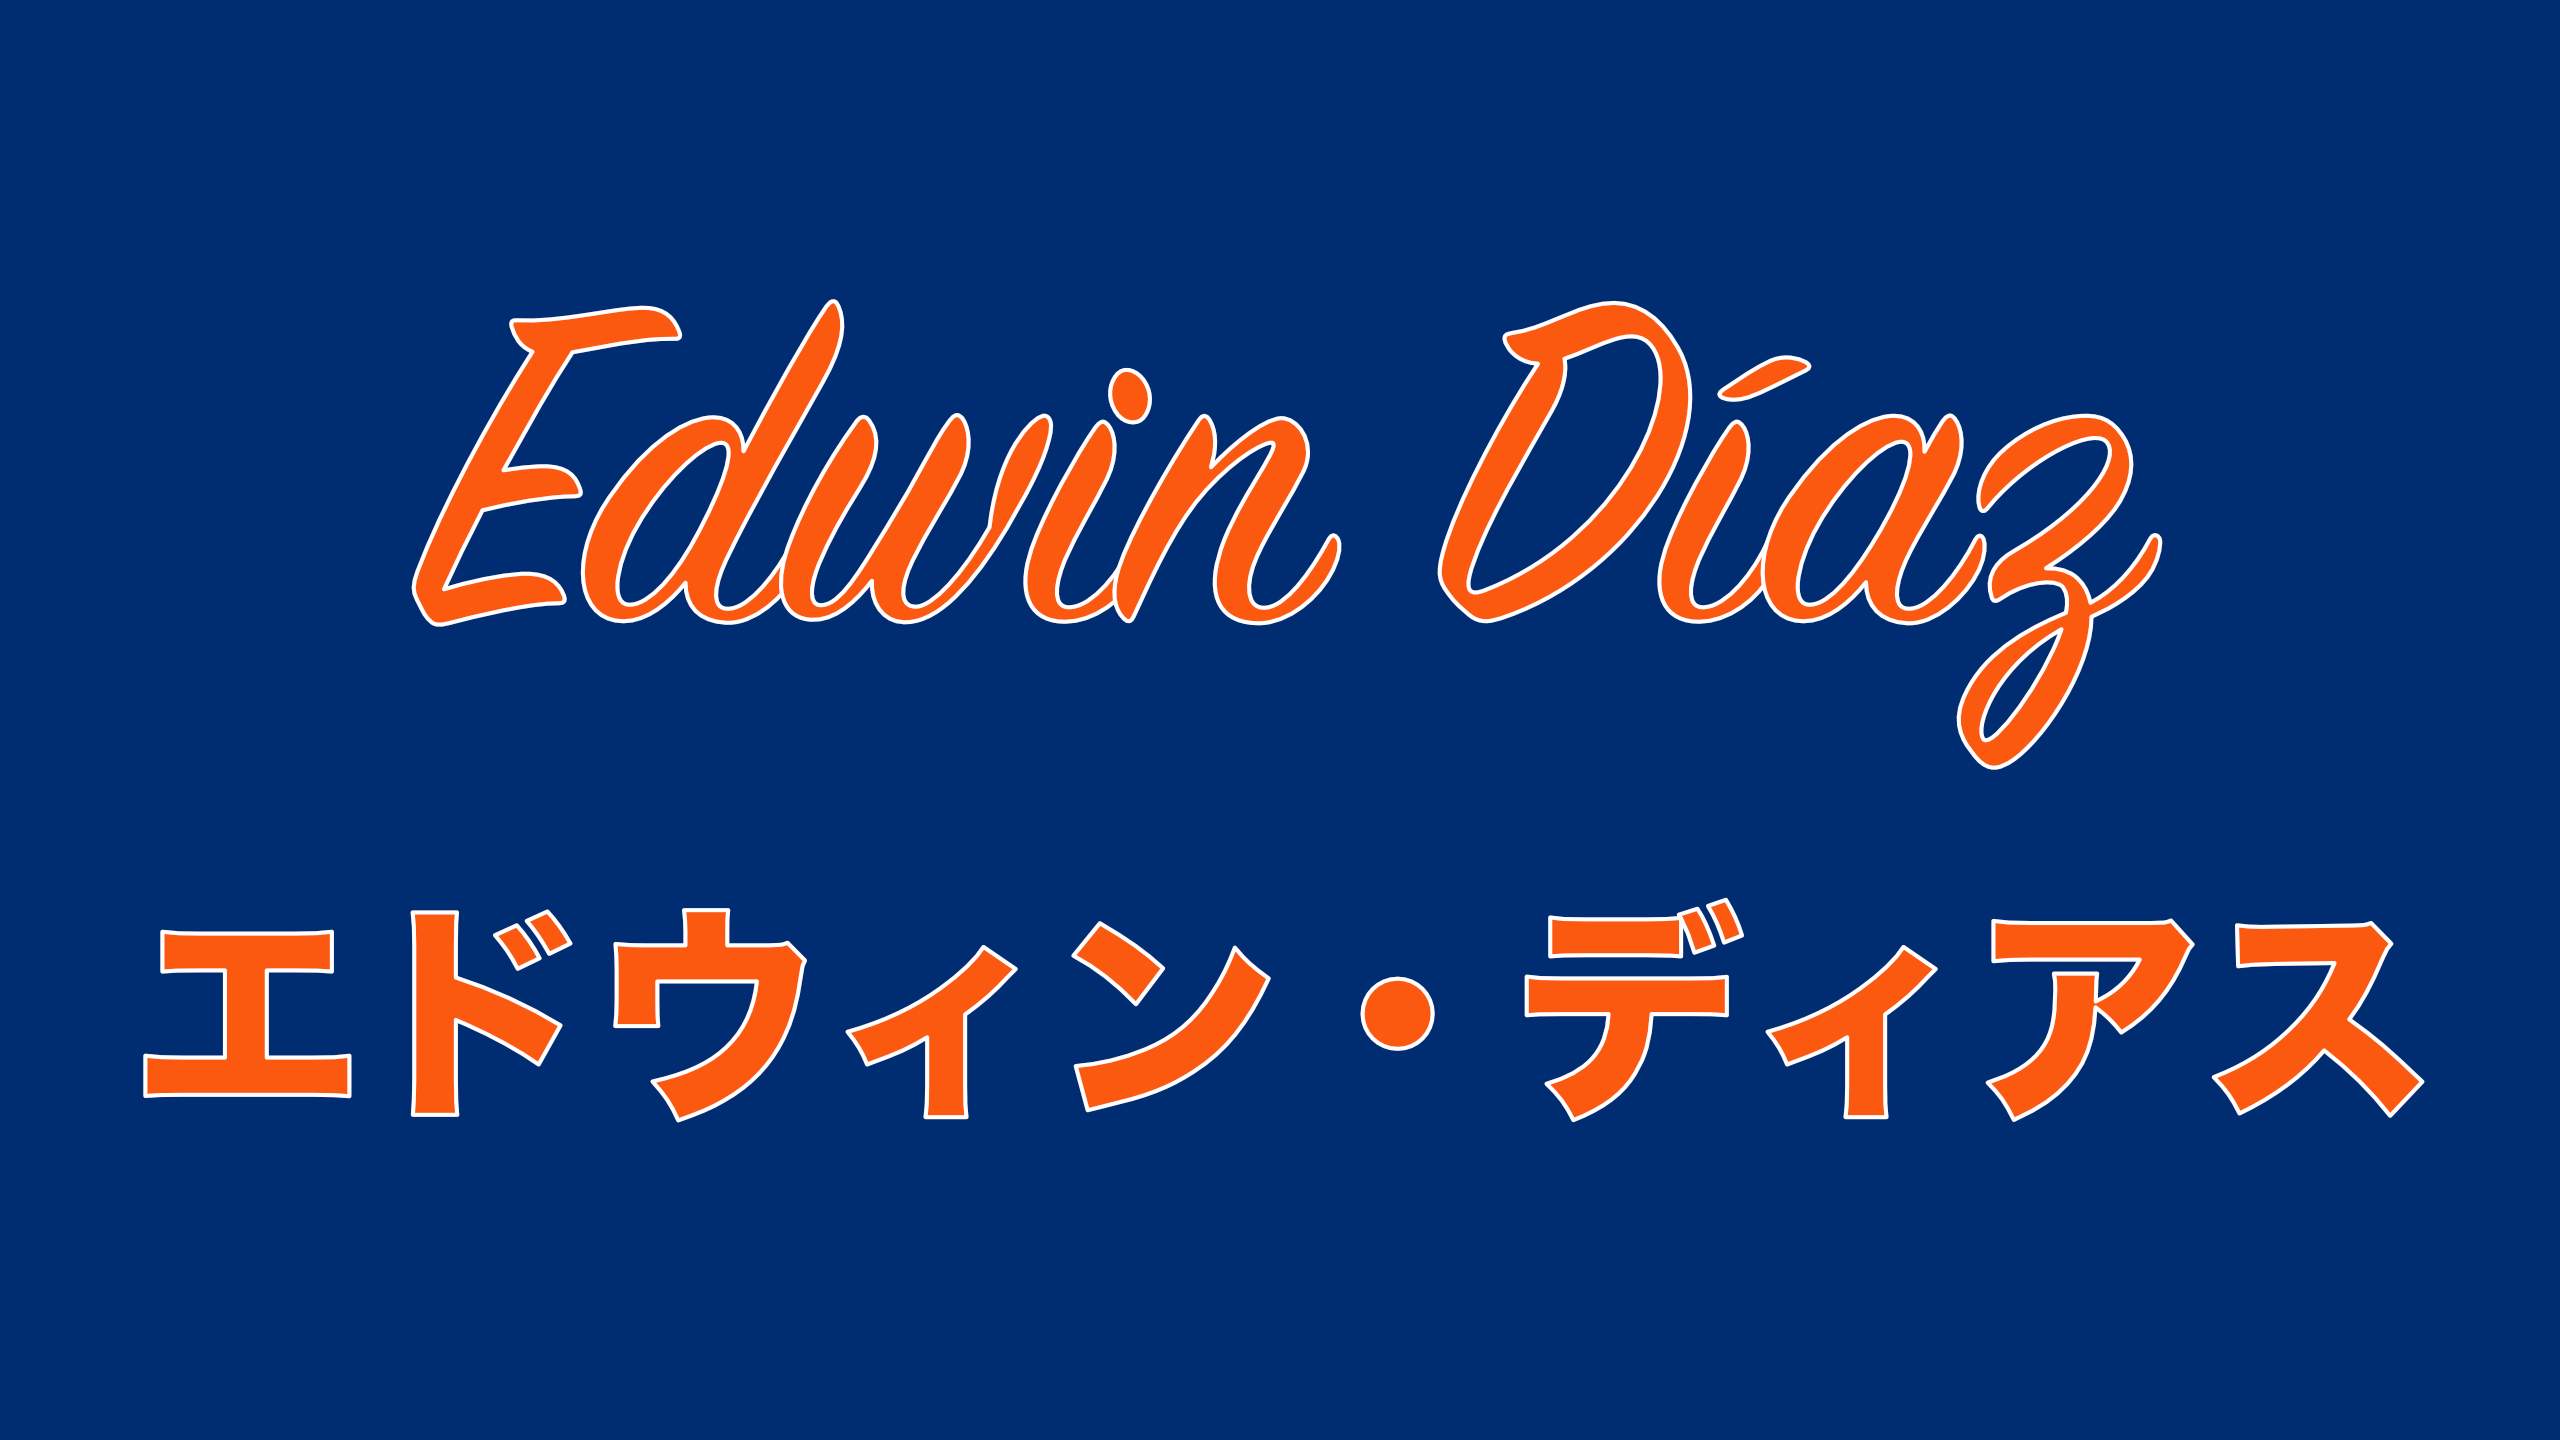 edwin-diaz